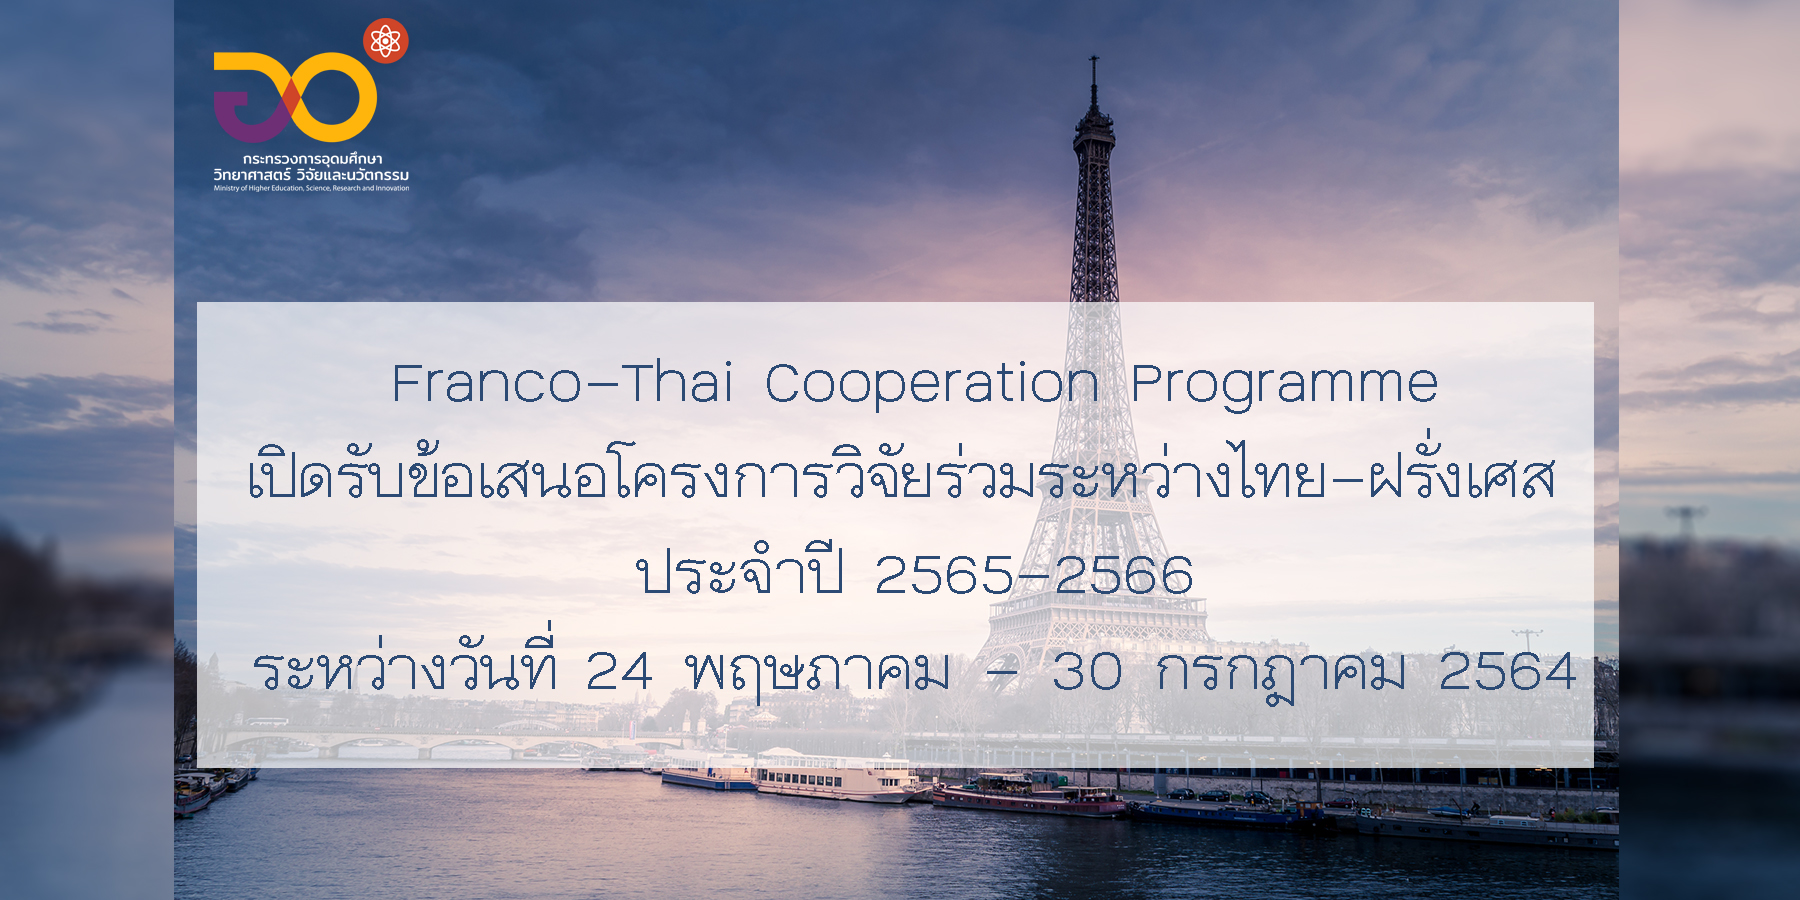 You are currently viewing เปิดรับข้อเสนอโครงการวิจัยร่วมระหว่างไทย-ฝรั่งเศส ประจำปี 2565-2566